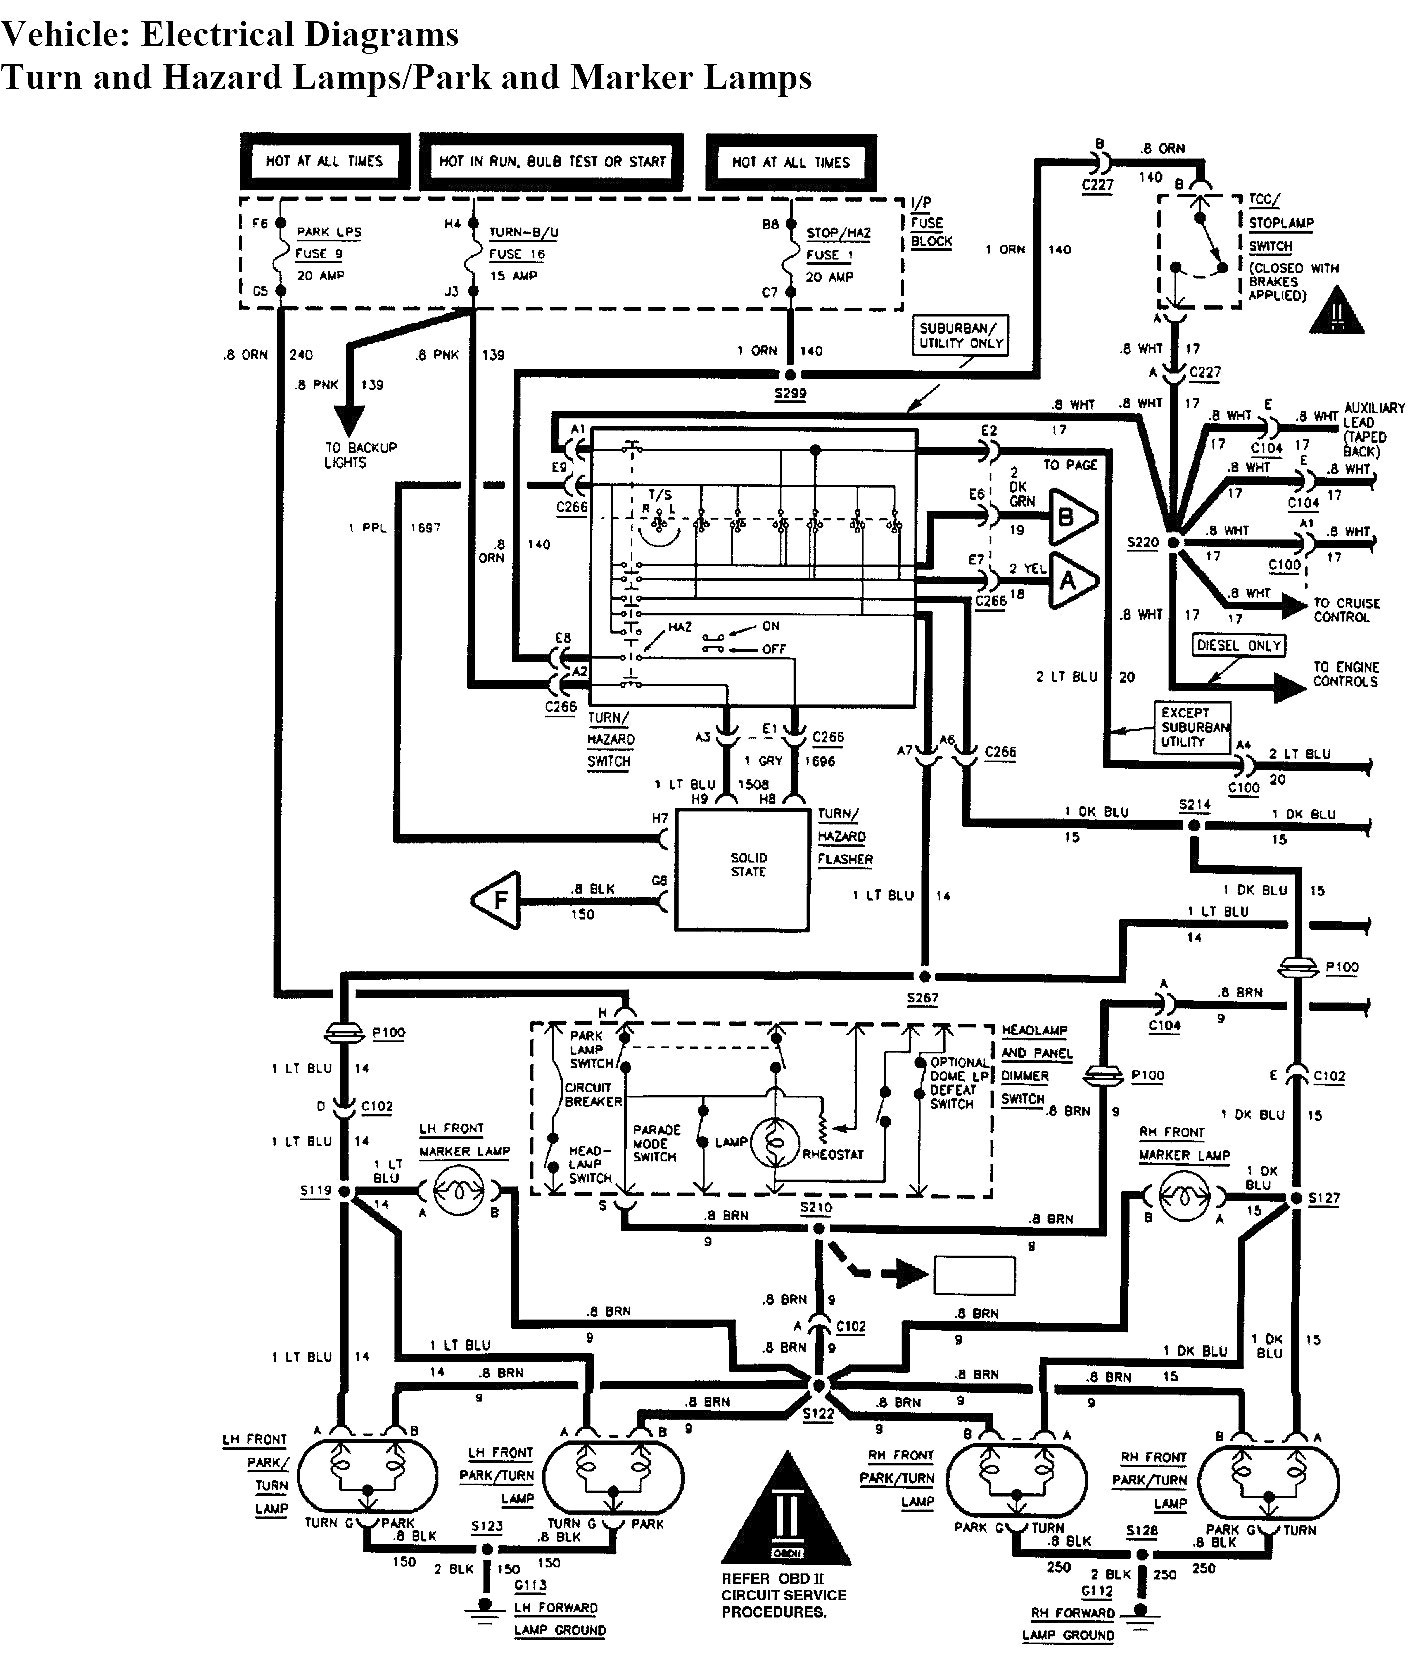 2000 Chevy Silverado Brake Light Wiring Diagram Beautiful Brake Light Wiring Diagram Chevy Wiring Of 2000 Chevy Silverado Brake Light Wiring Diagram